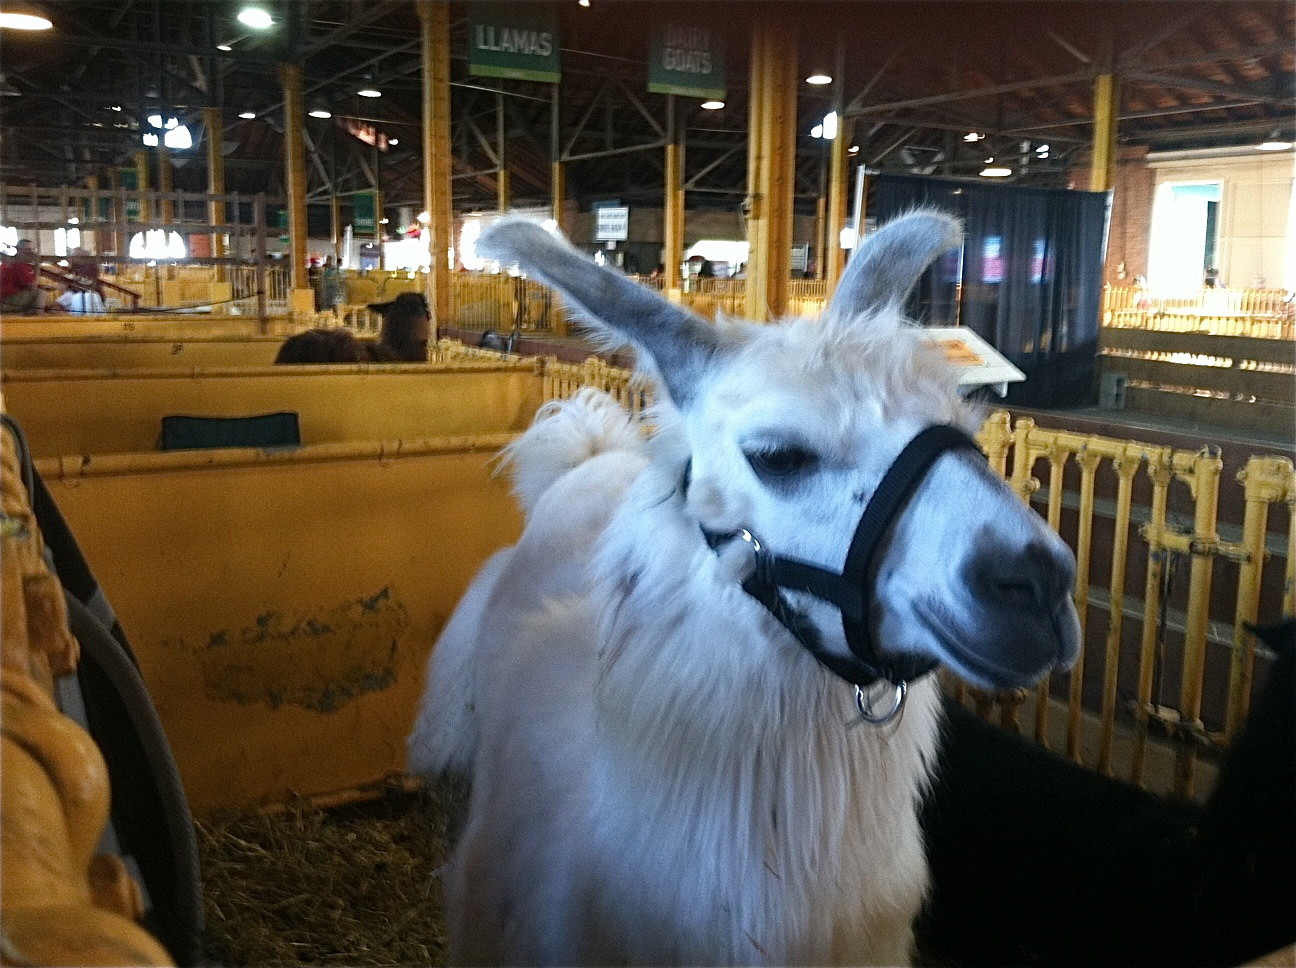 the llama is happy